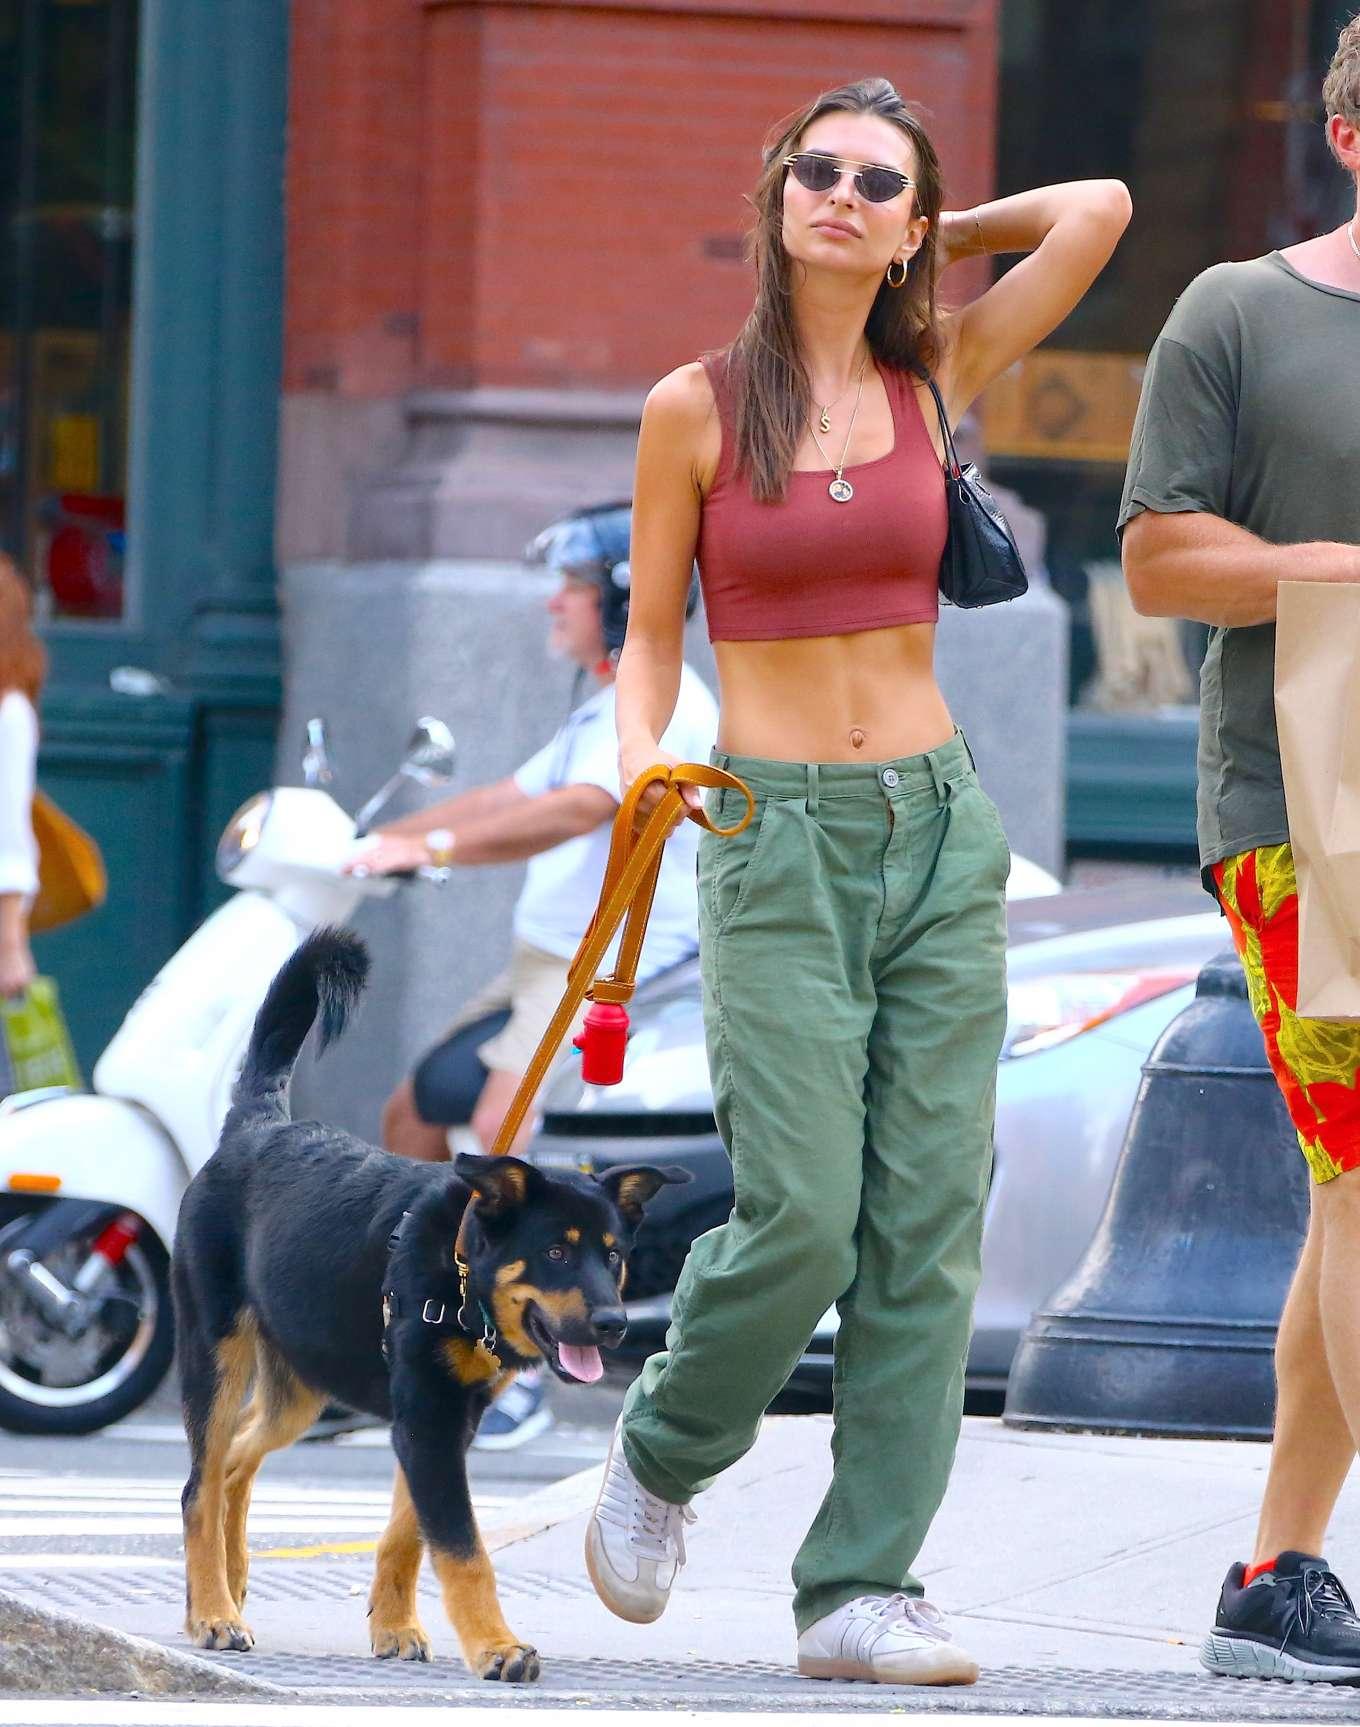 Emily Ratajkowski - Spotted walking her dog in New York City